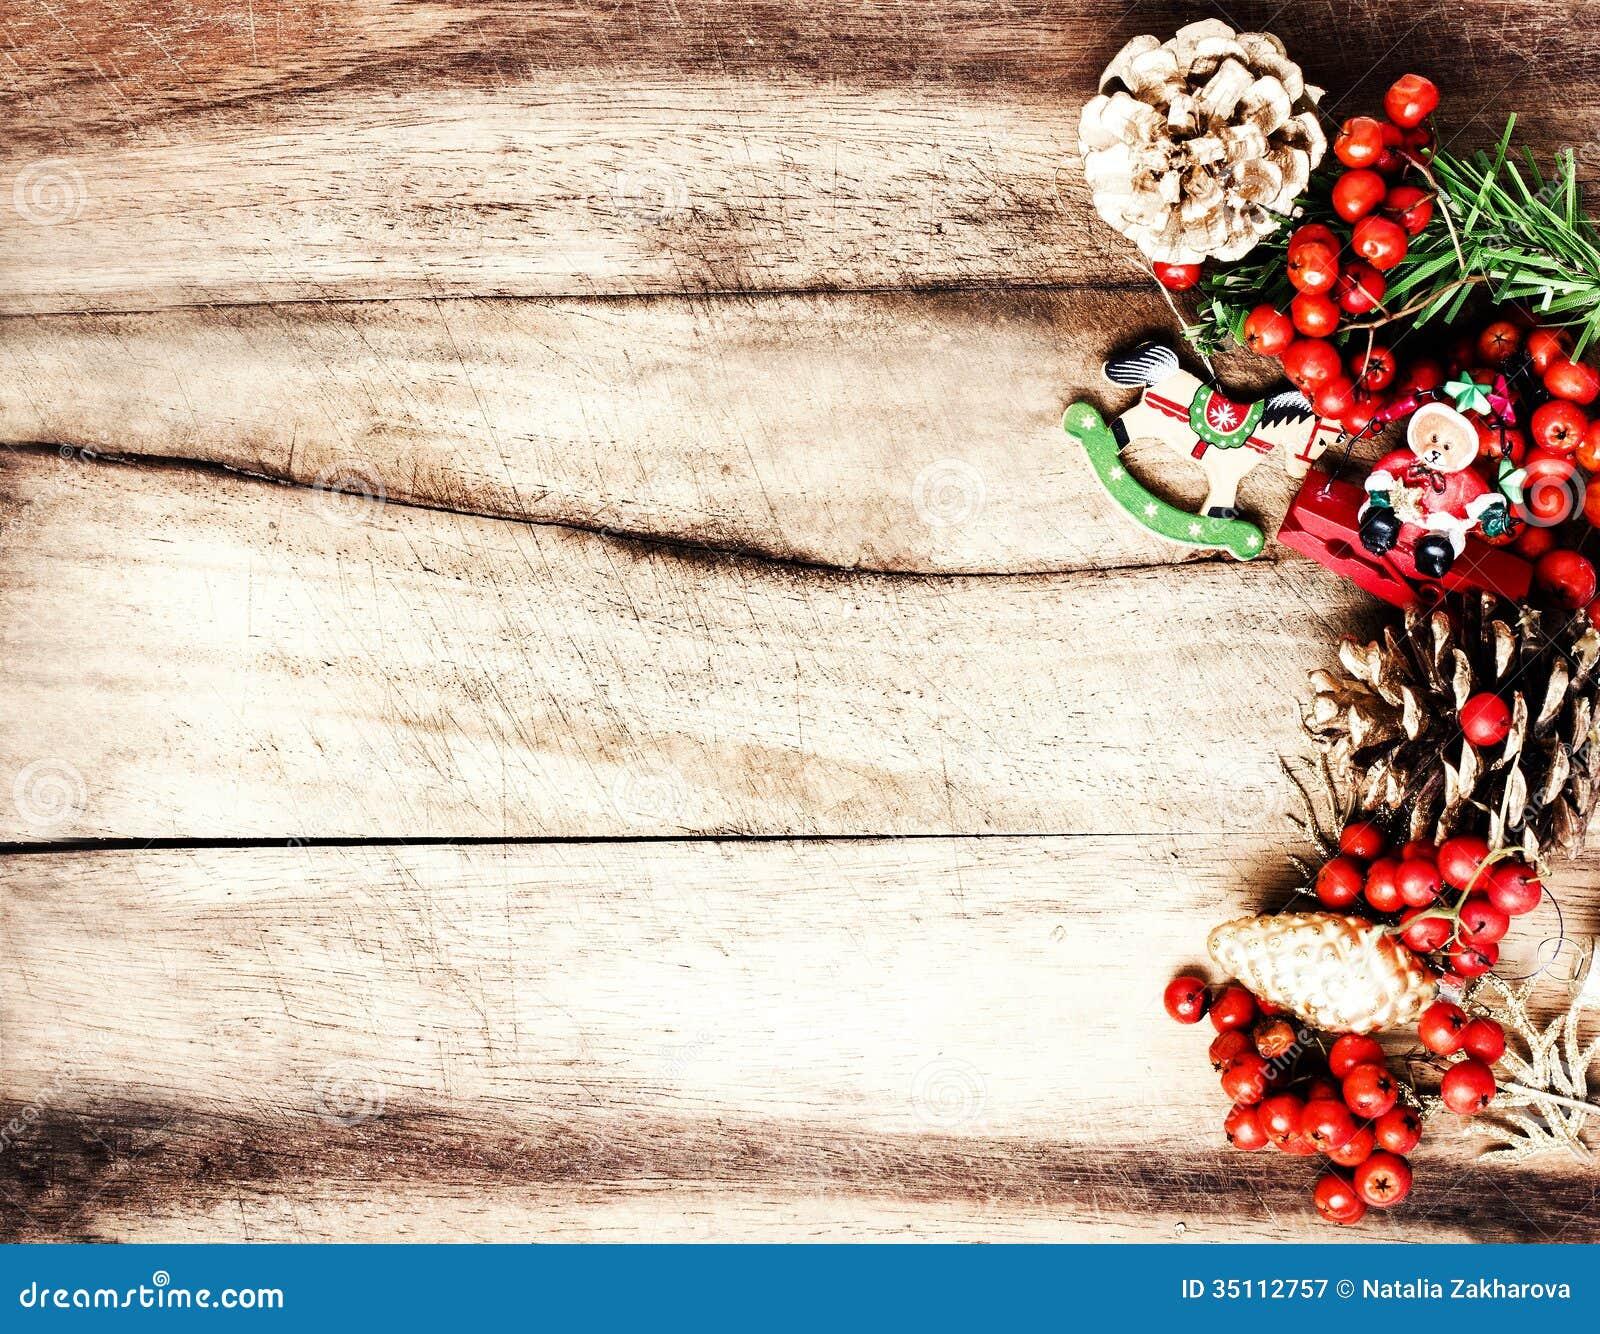 #BA1811 Rustic Christmas Decoration On Natural Wooden Board  5535 décorations de noel vintage 1300x1100 px @ aertt.com